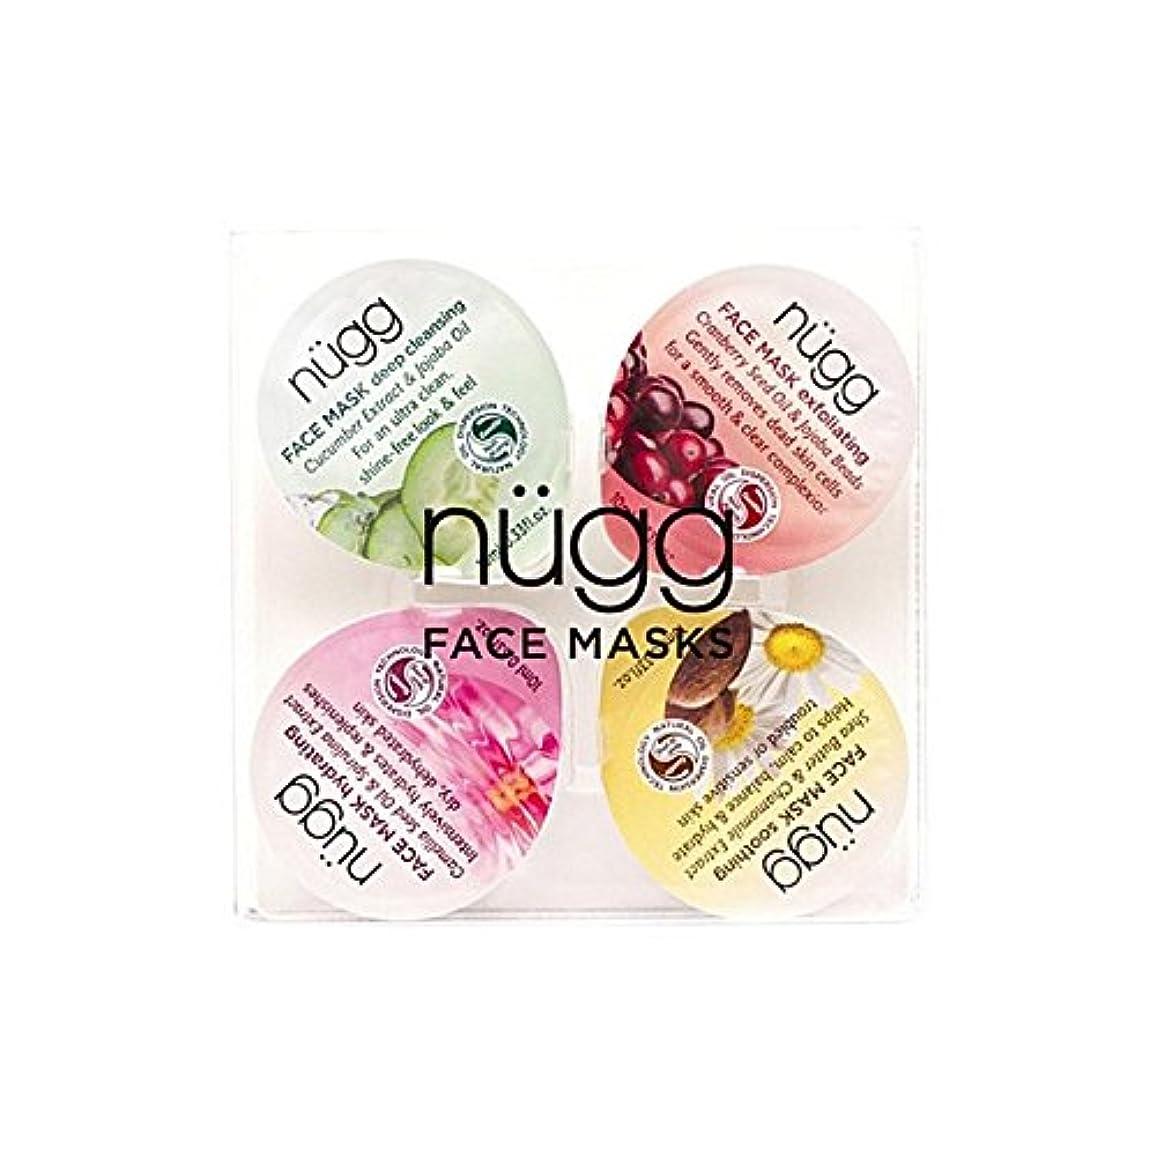 Nugg Face Mask Set - フェイスマスクセット [並行輸入品]